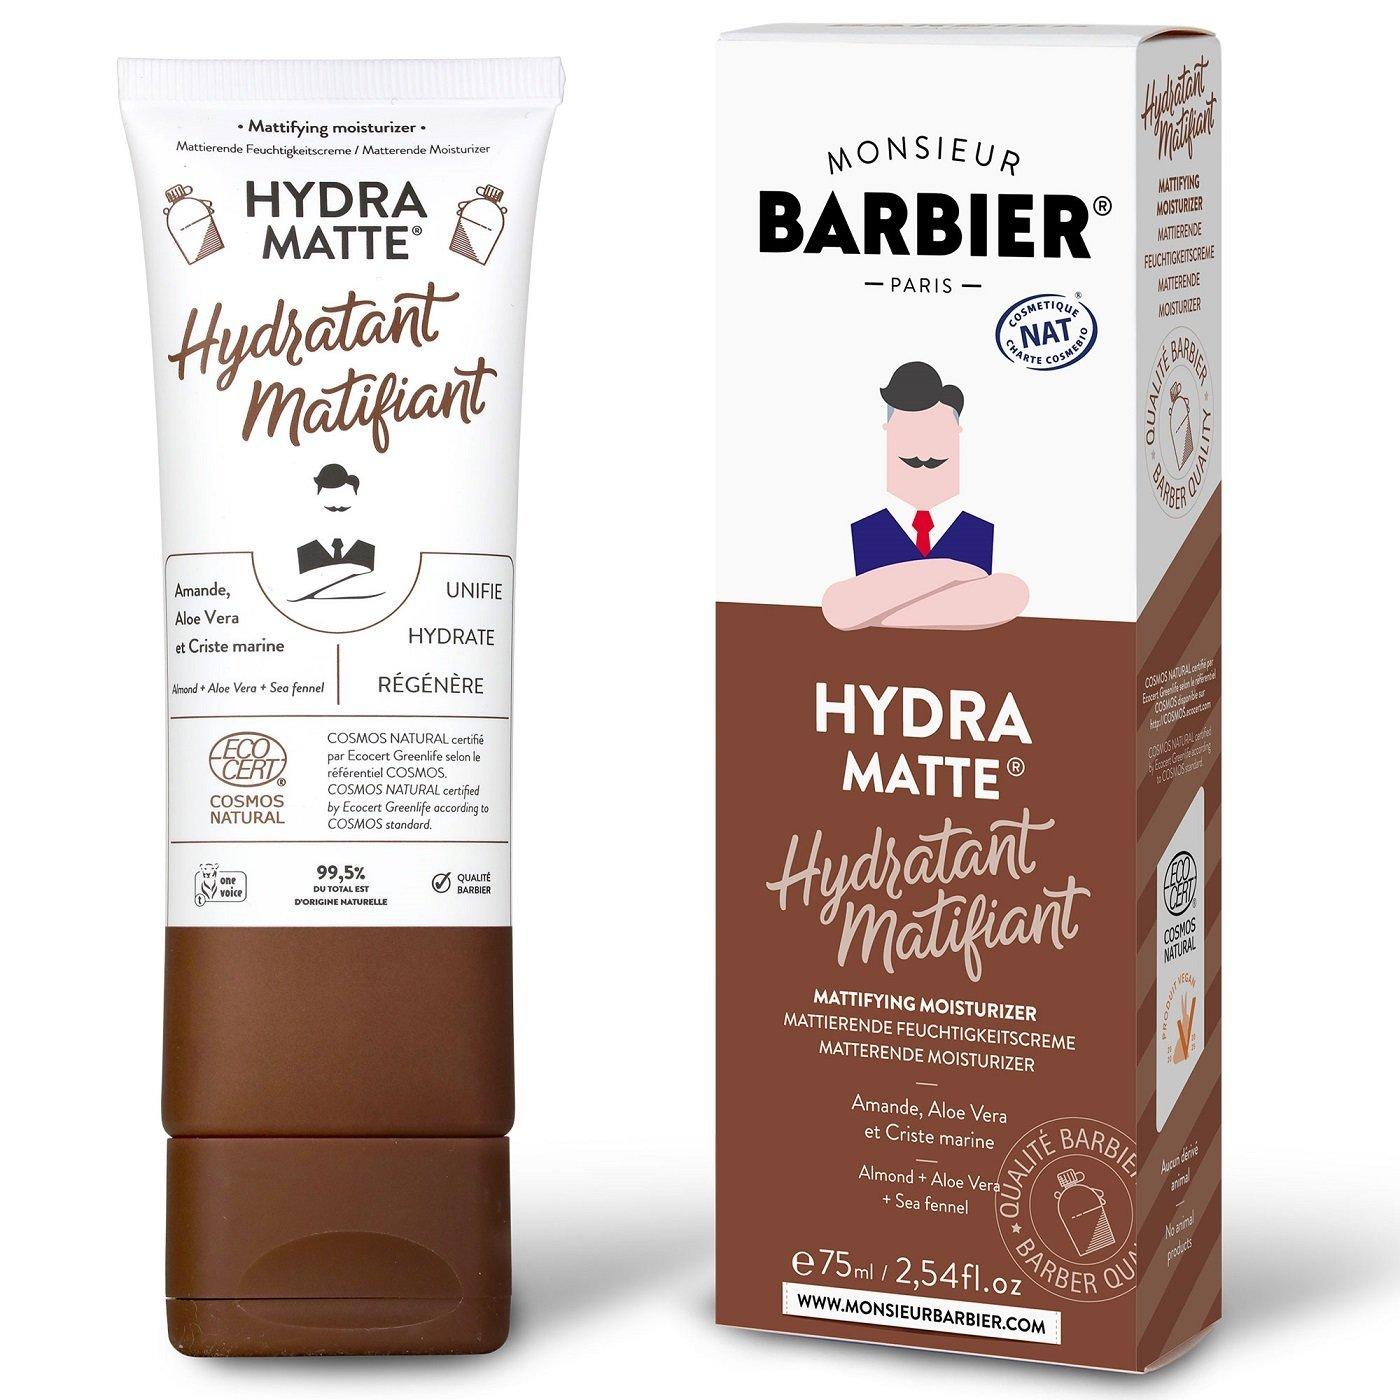 Crème hydratante matifiante hydra matte 75 mL